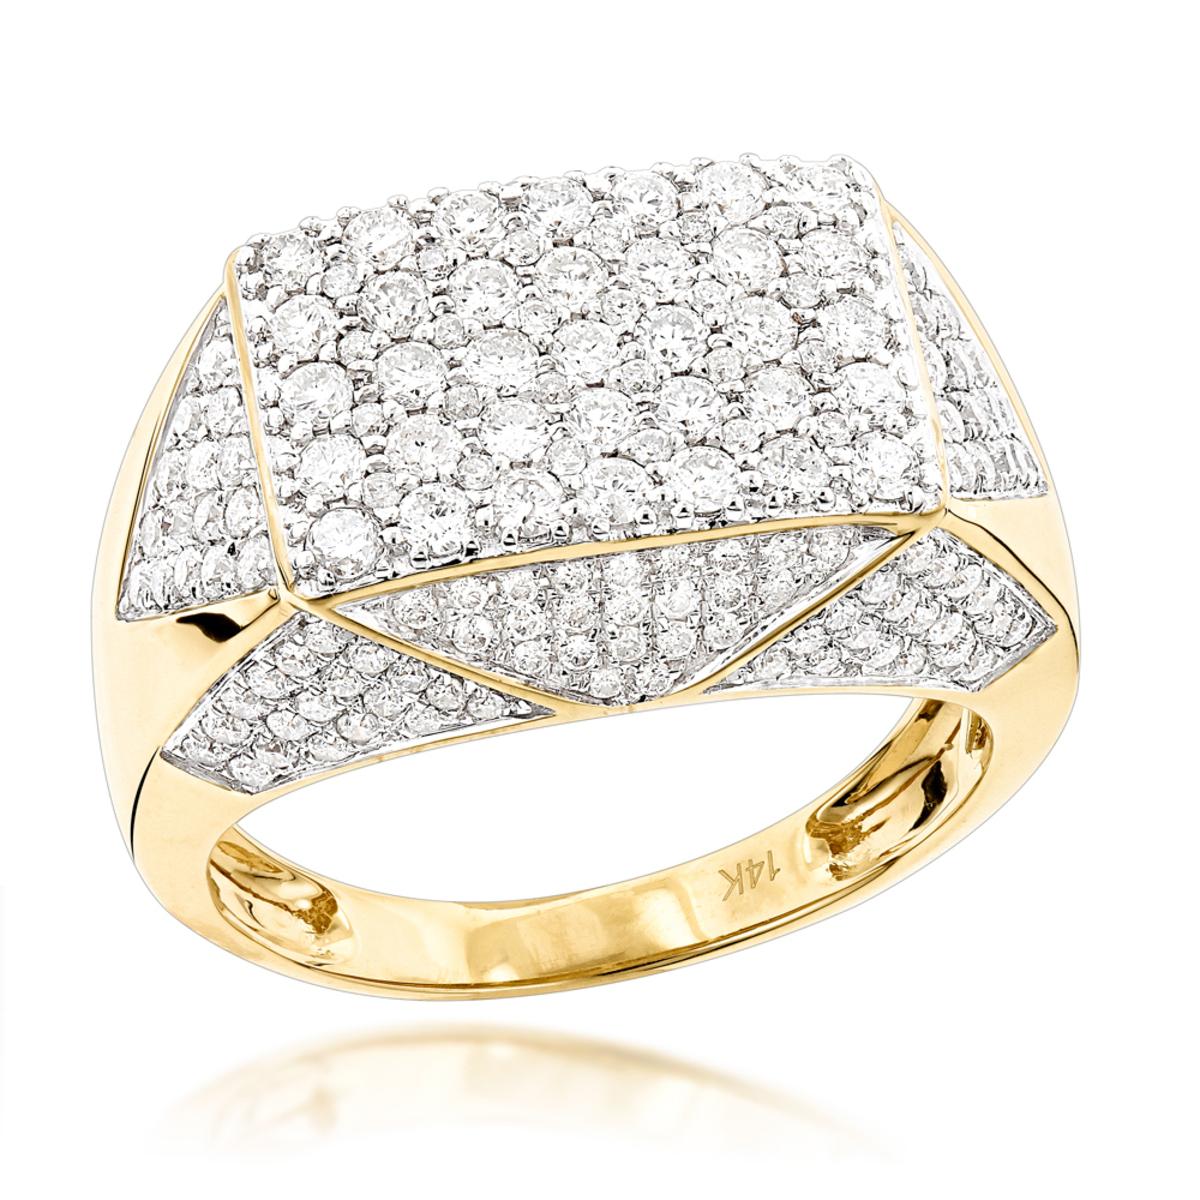 14K Gold Mens Diamond Ring 275ct Pinky Ring